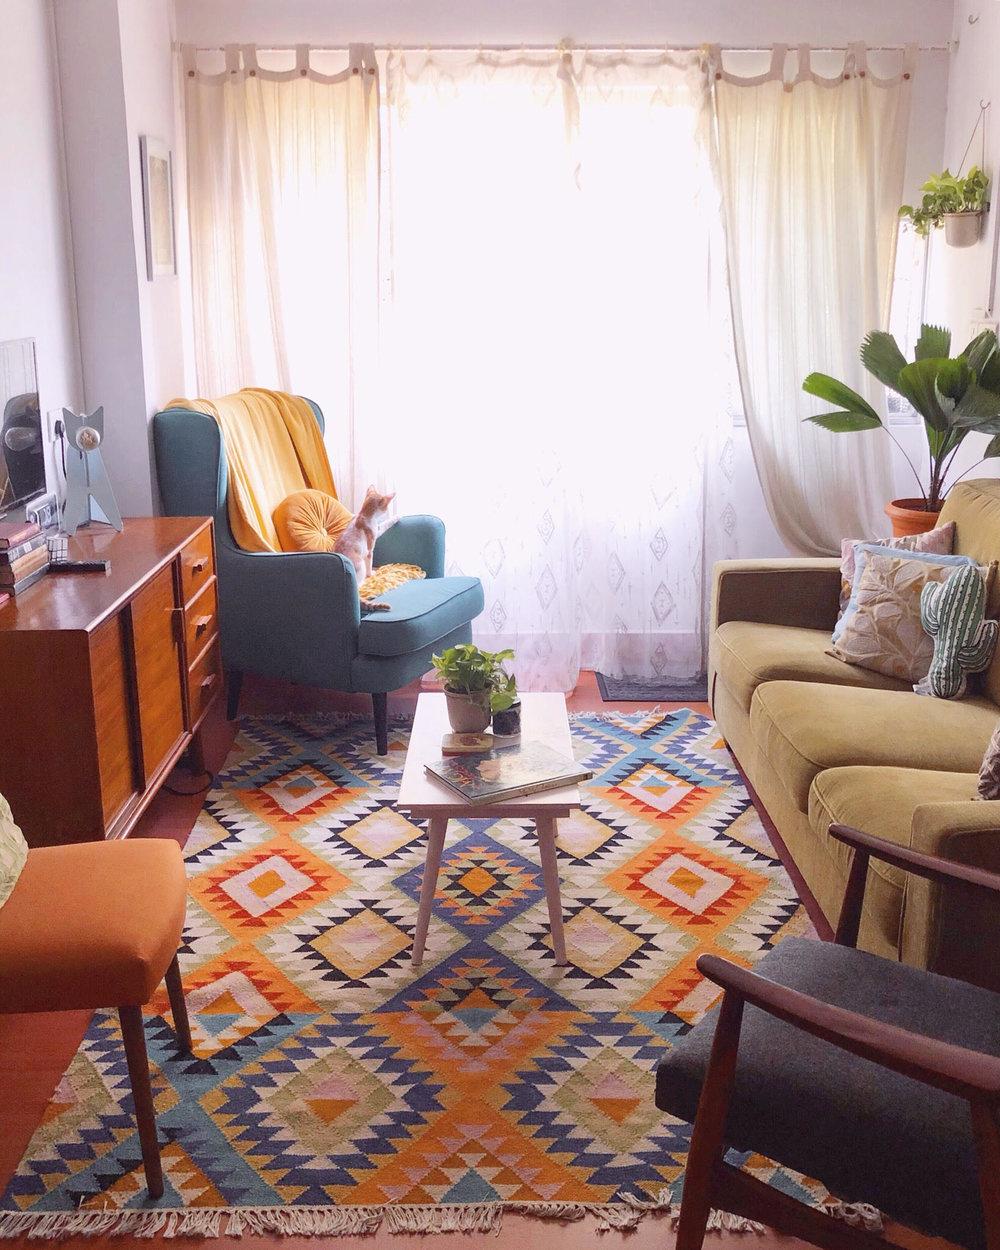 Orange chair: Pepperfry / Center table; Credenza, Grey chair:  Oshiwara  / Wingback chair: Urbanladder / Rug: Dilli Haat